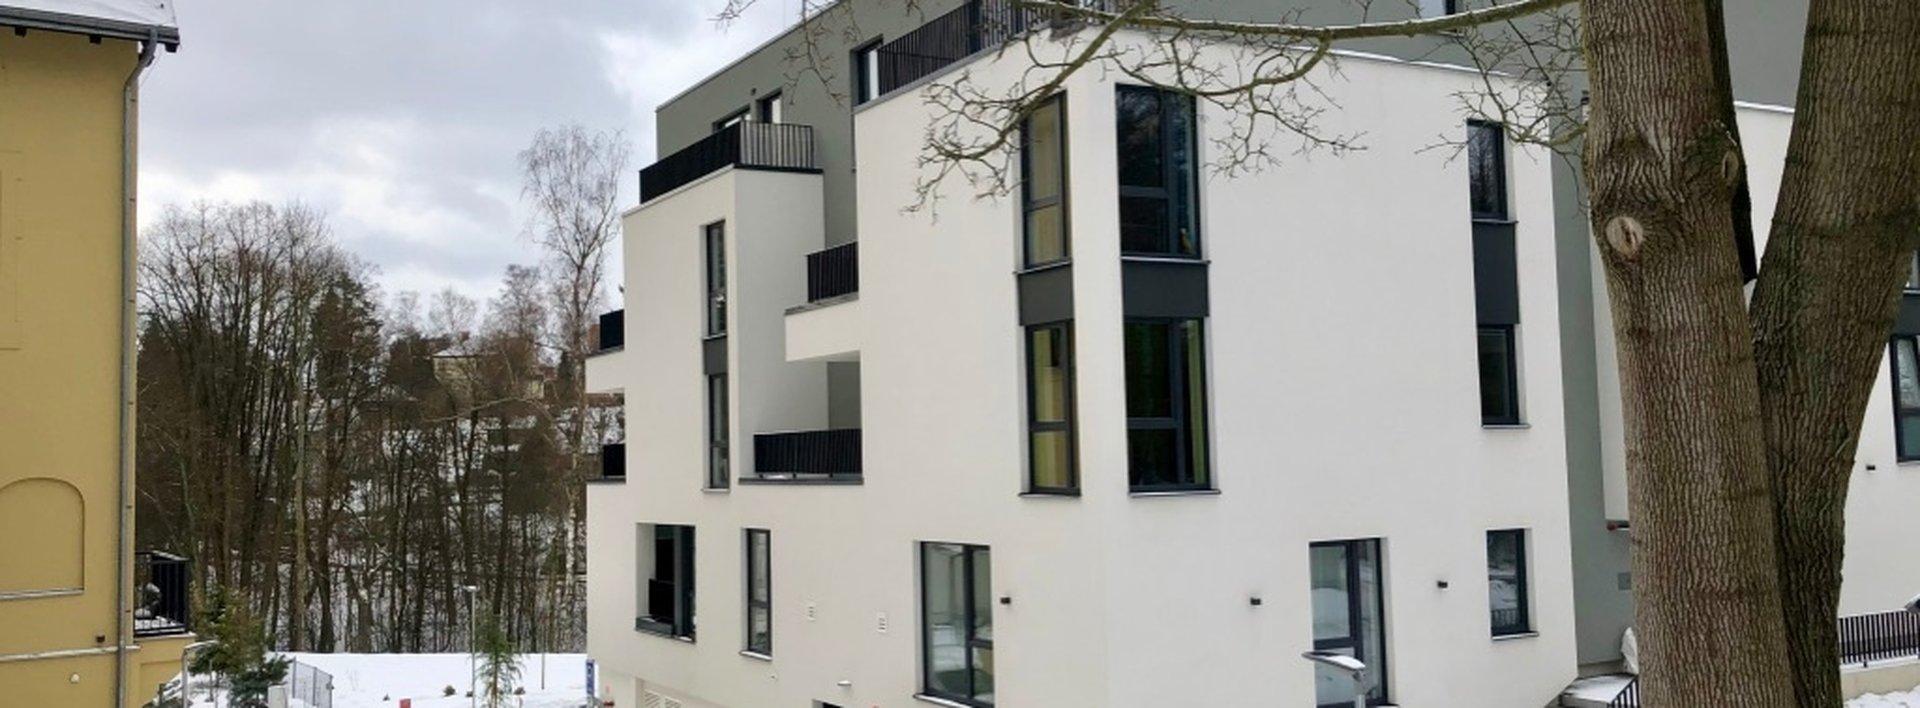 Pronájem bytu 3+kk s lodžií + krytým stáním - Liberec, ul. Riegrova, Ev.č.: N48662